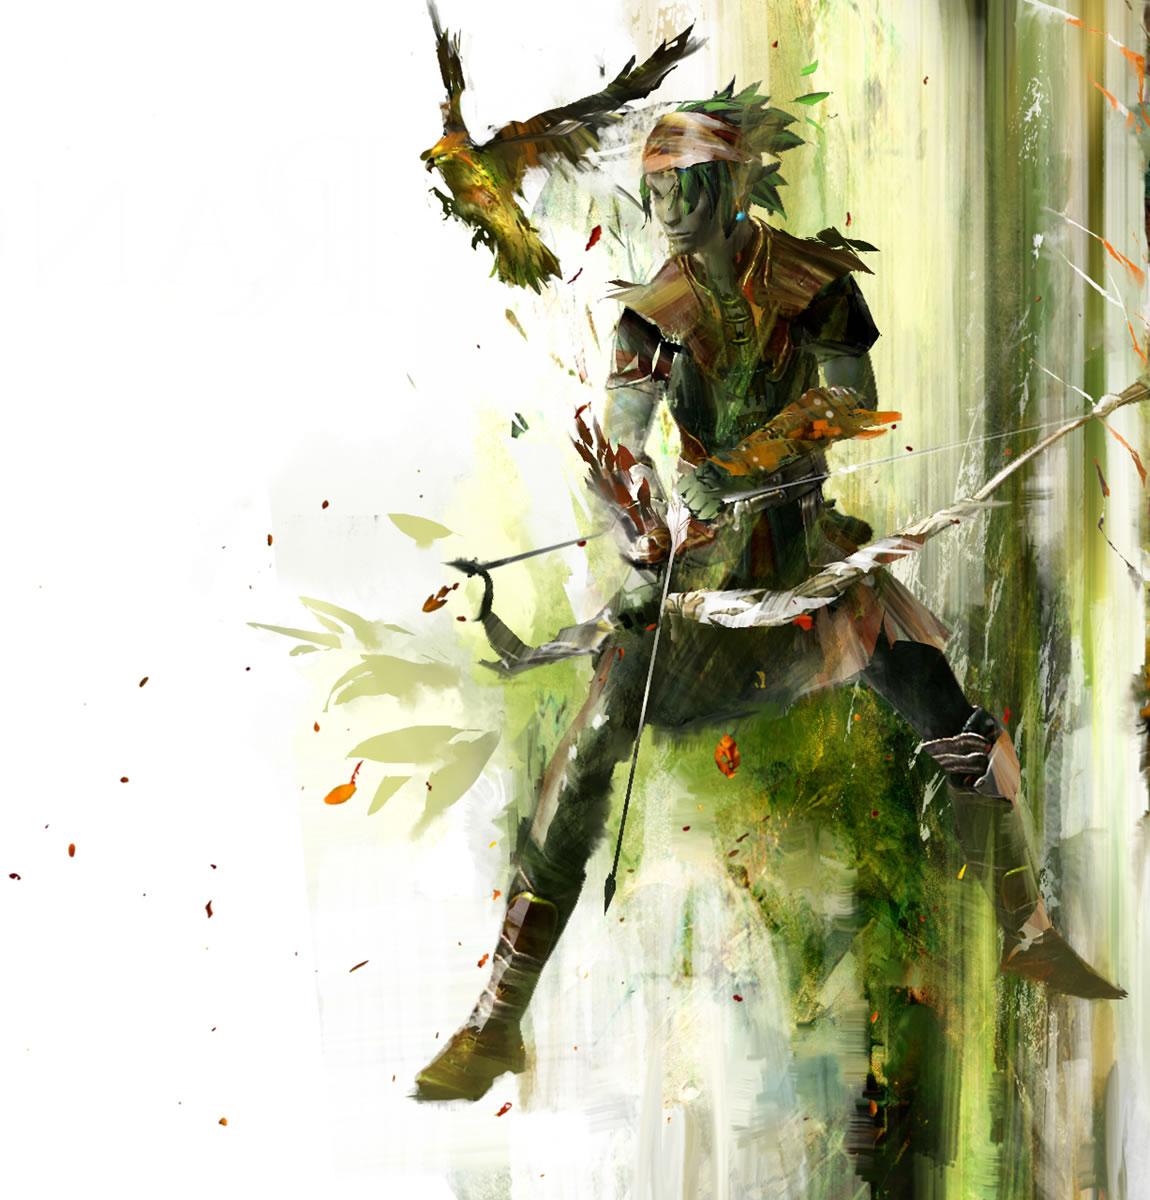 https://i0.wp.com/wiki.guildwars2.com/images/b/b7/Ranger_02_concept_art.jpg